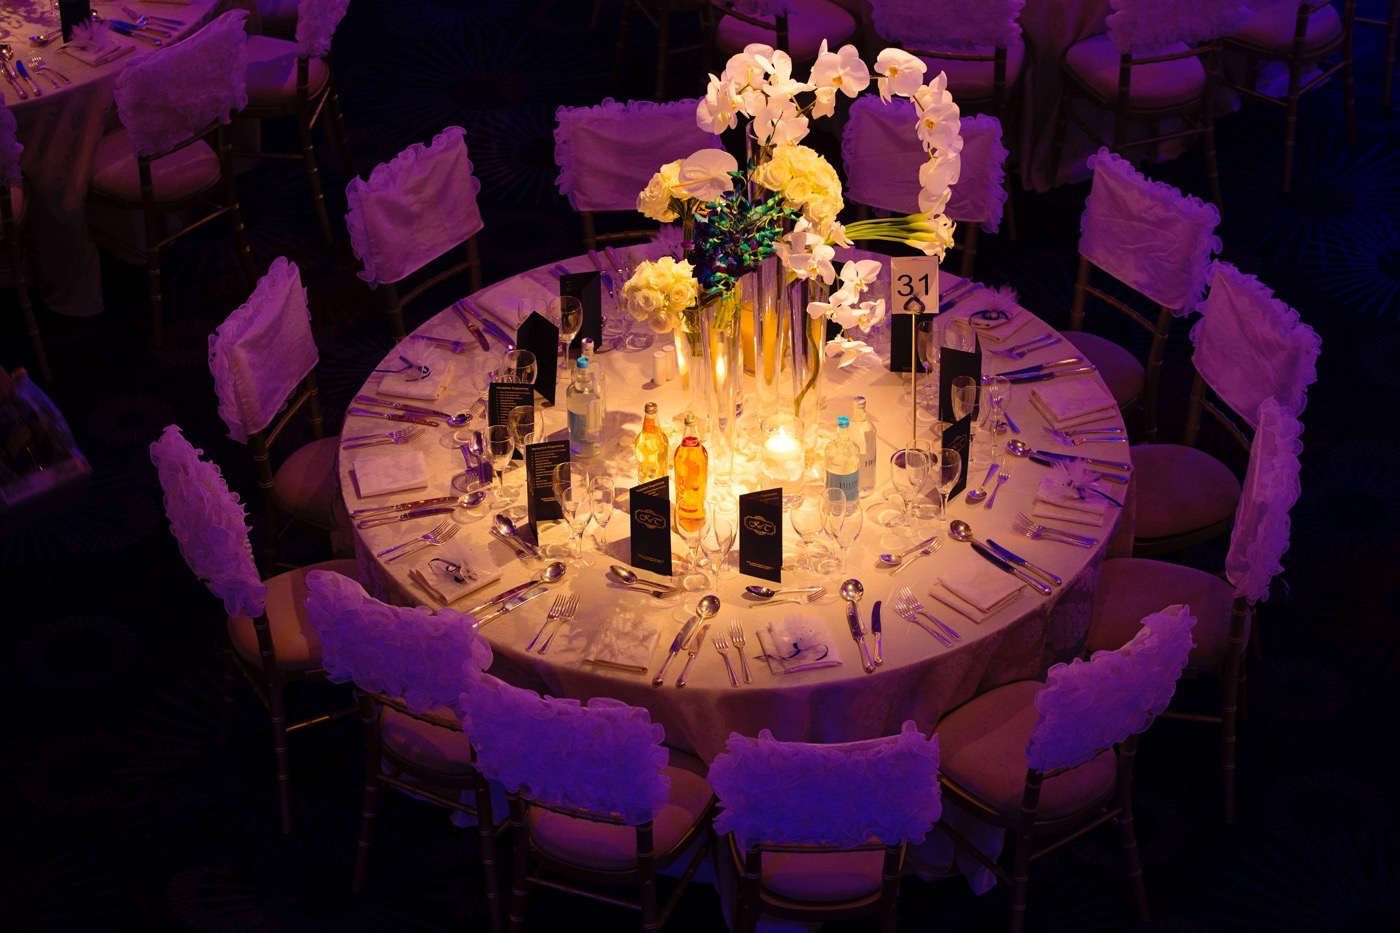 Blue and White Glamorous Grosvenor House Wedding 32